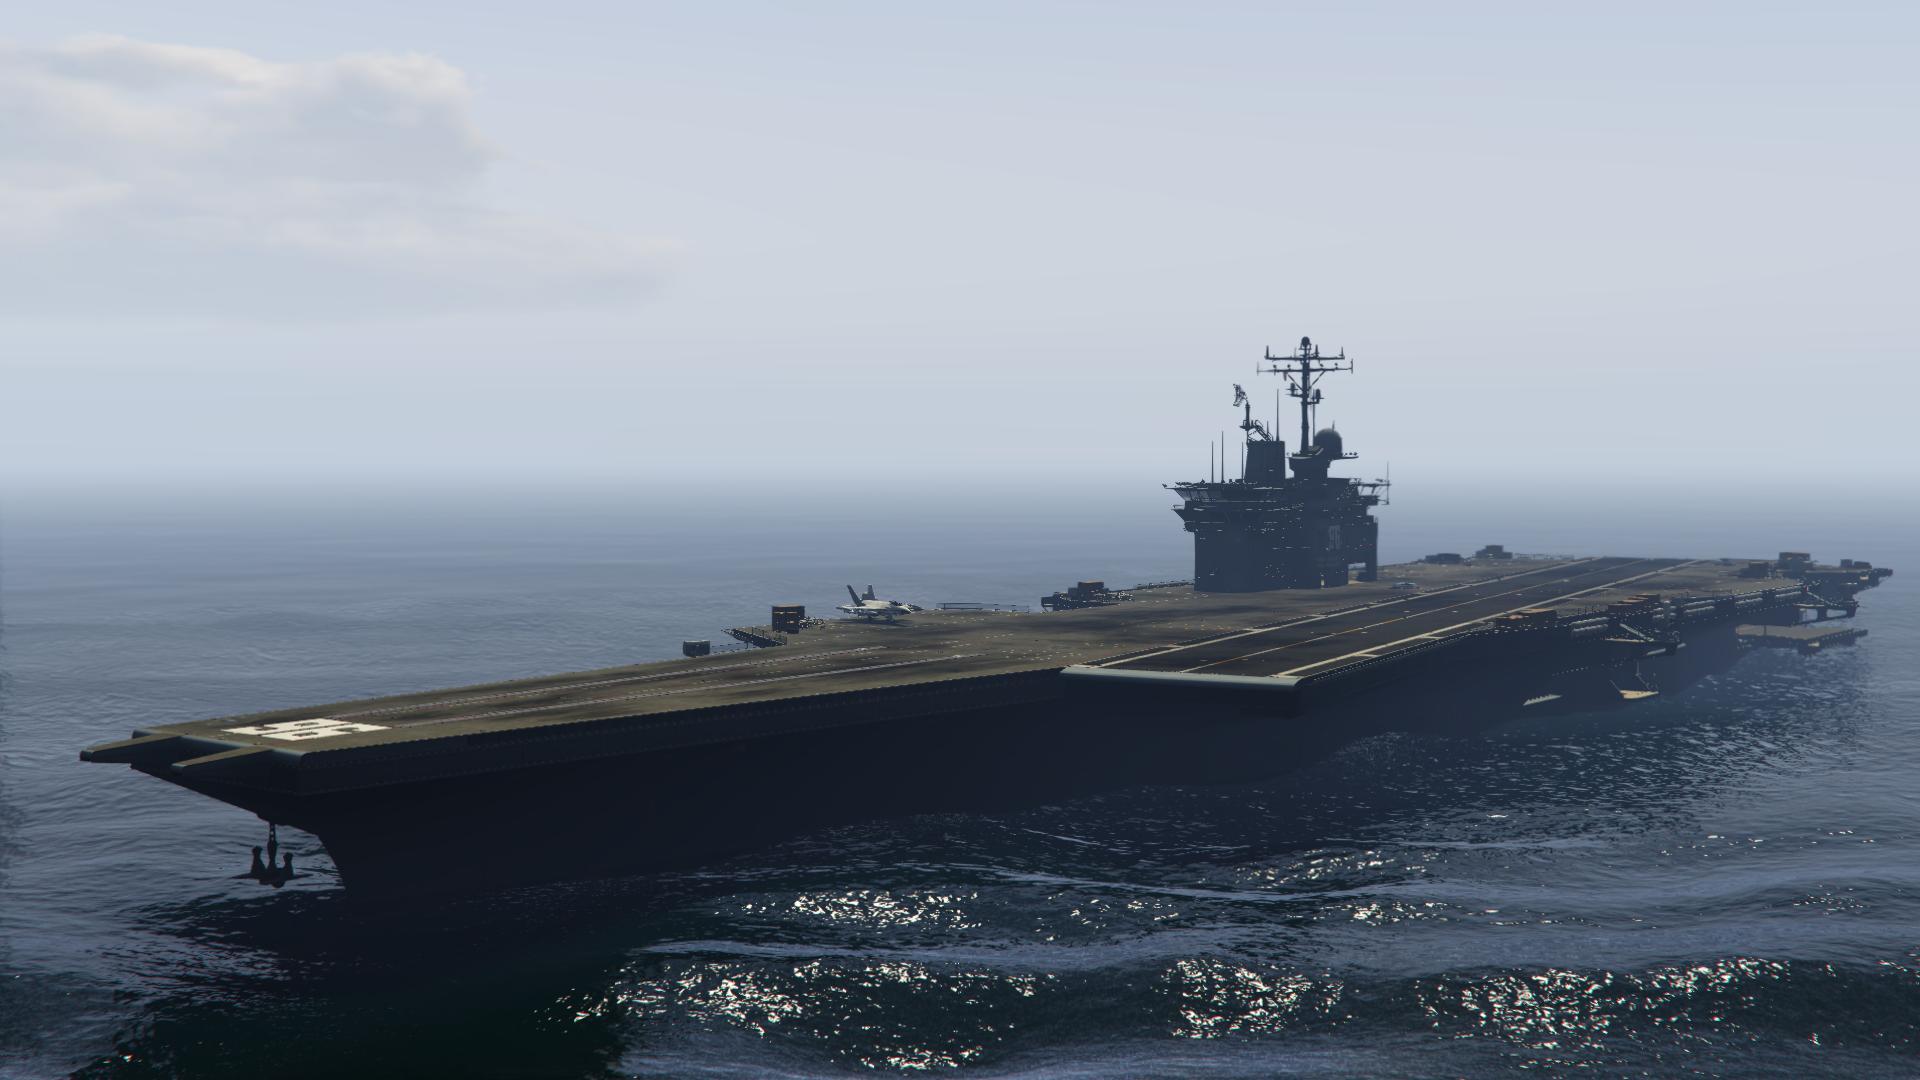 USS Luxington ATT 16 USS Luxington ATT 16